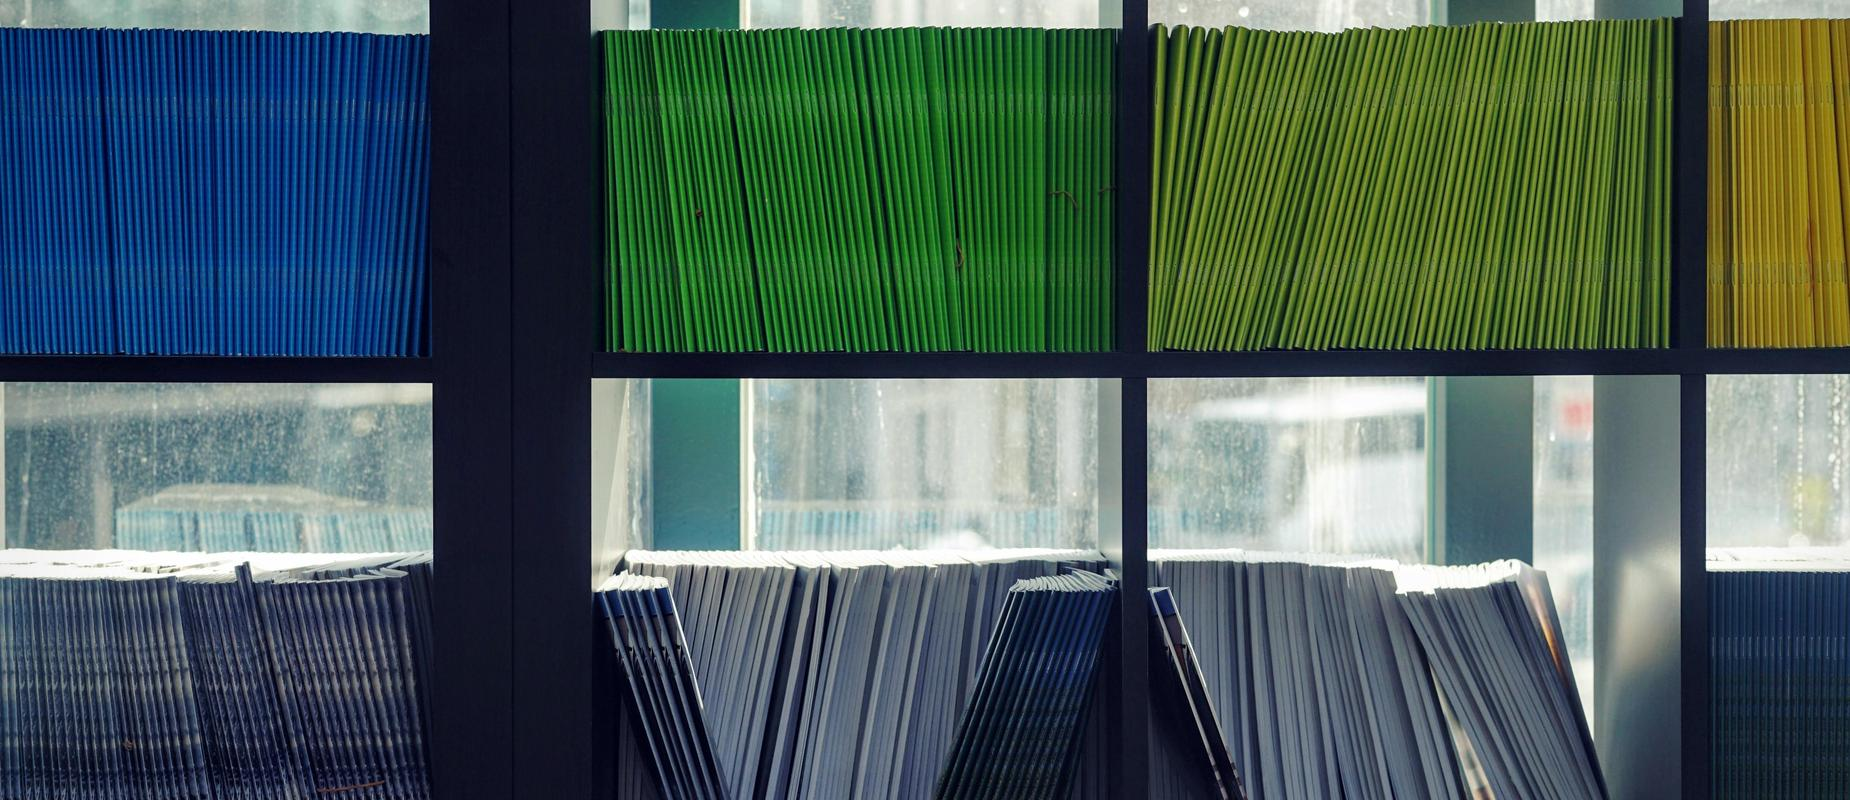 Image of workbooks and file folders